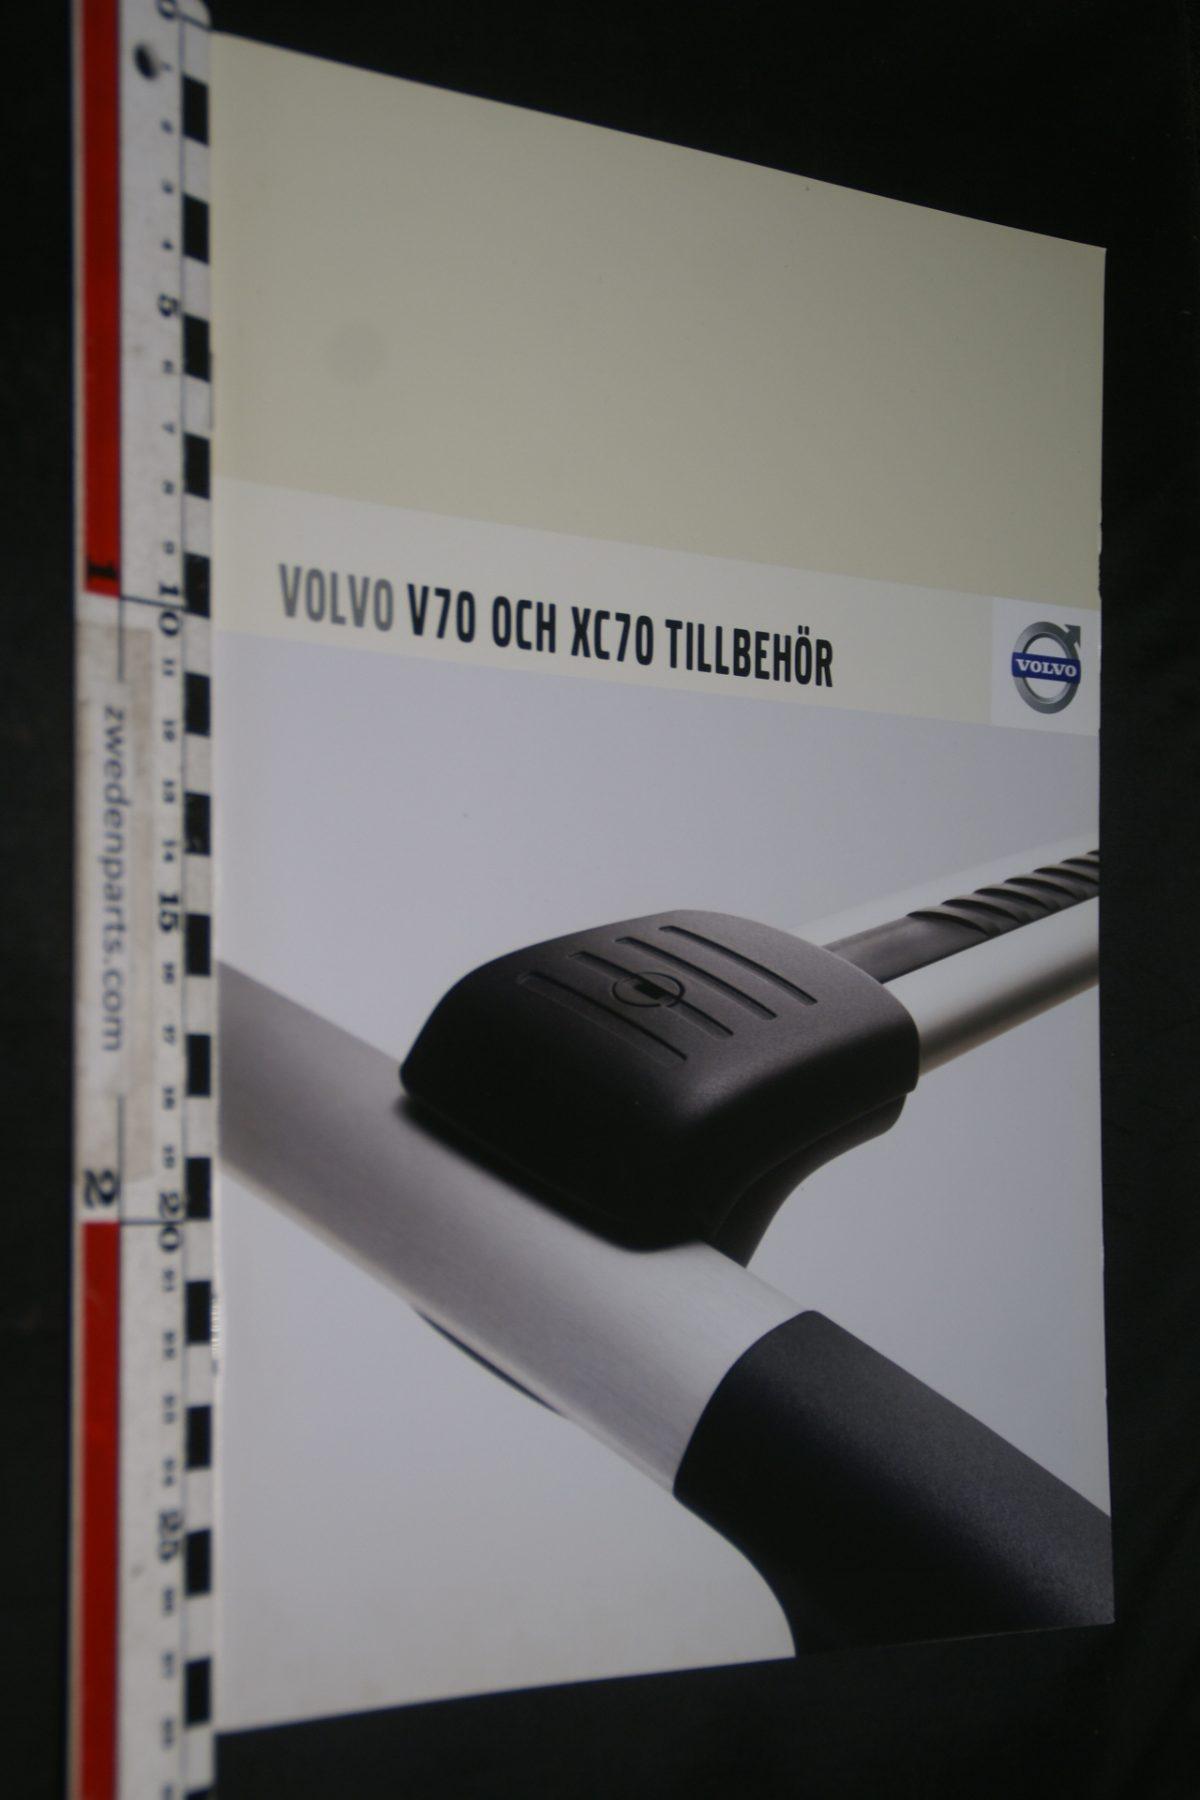 DSC06042 2007 brochure Volvo V70 en XC70 accessoires nr. MSPV 527-4960